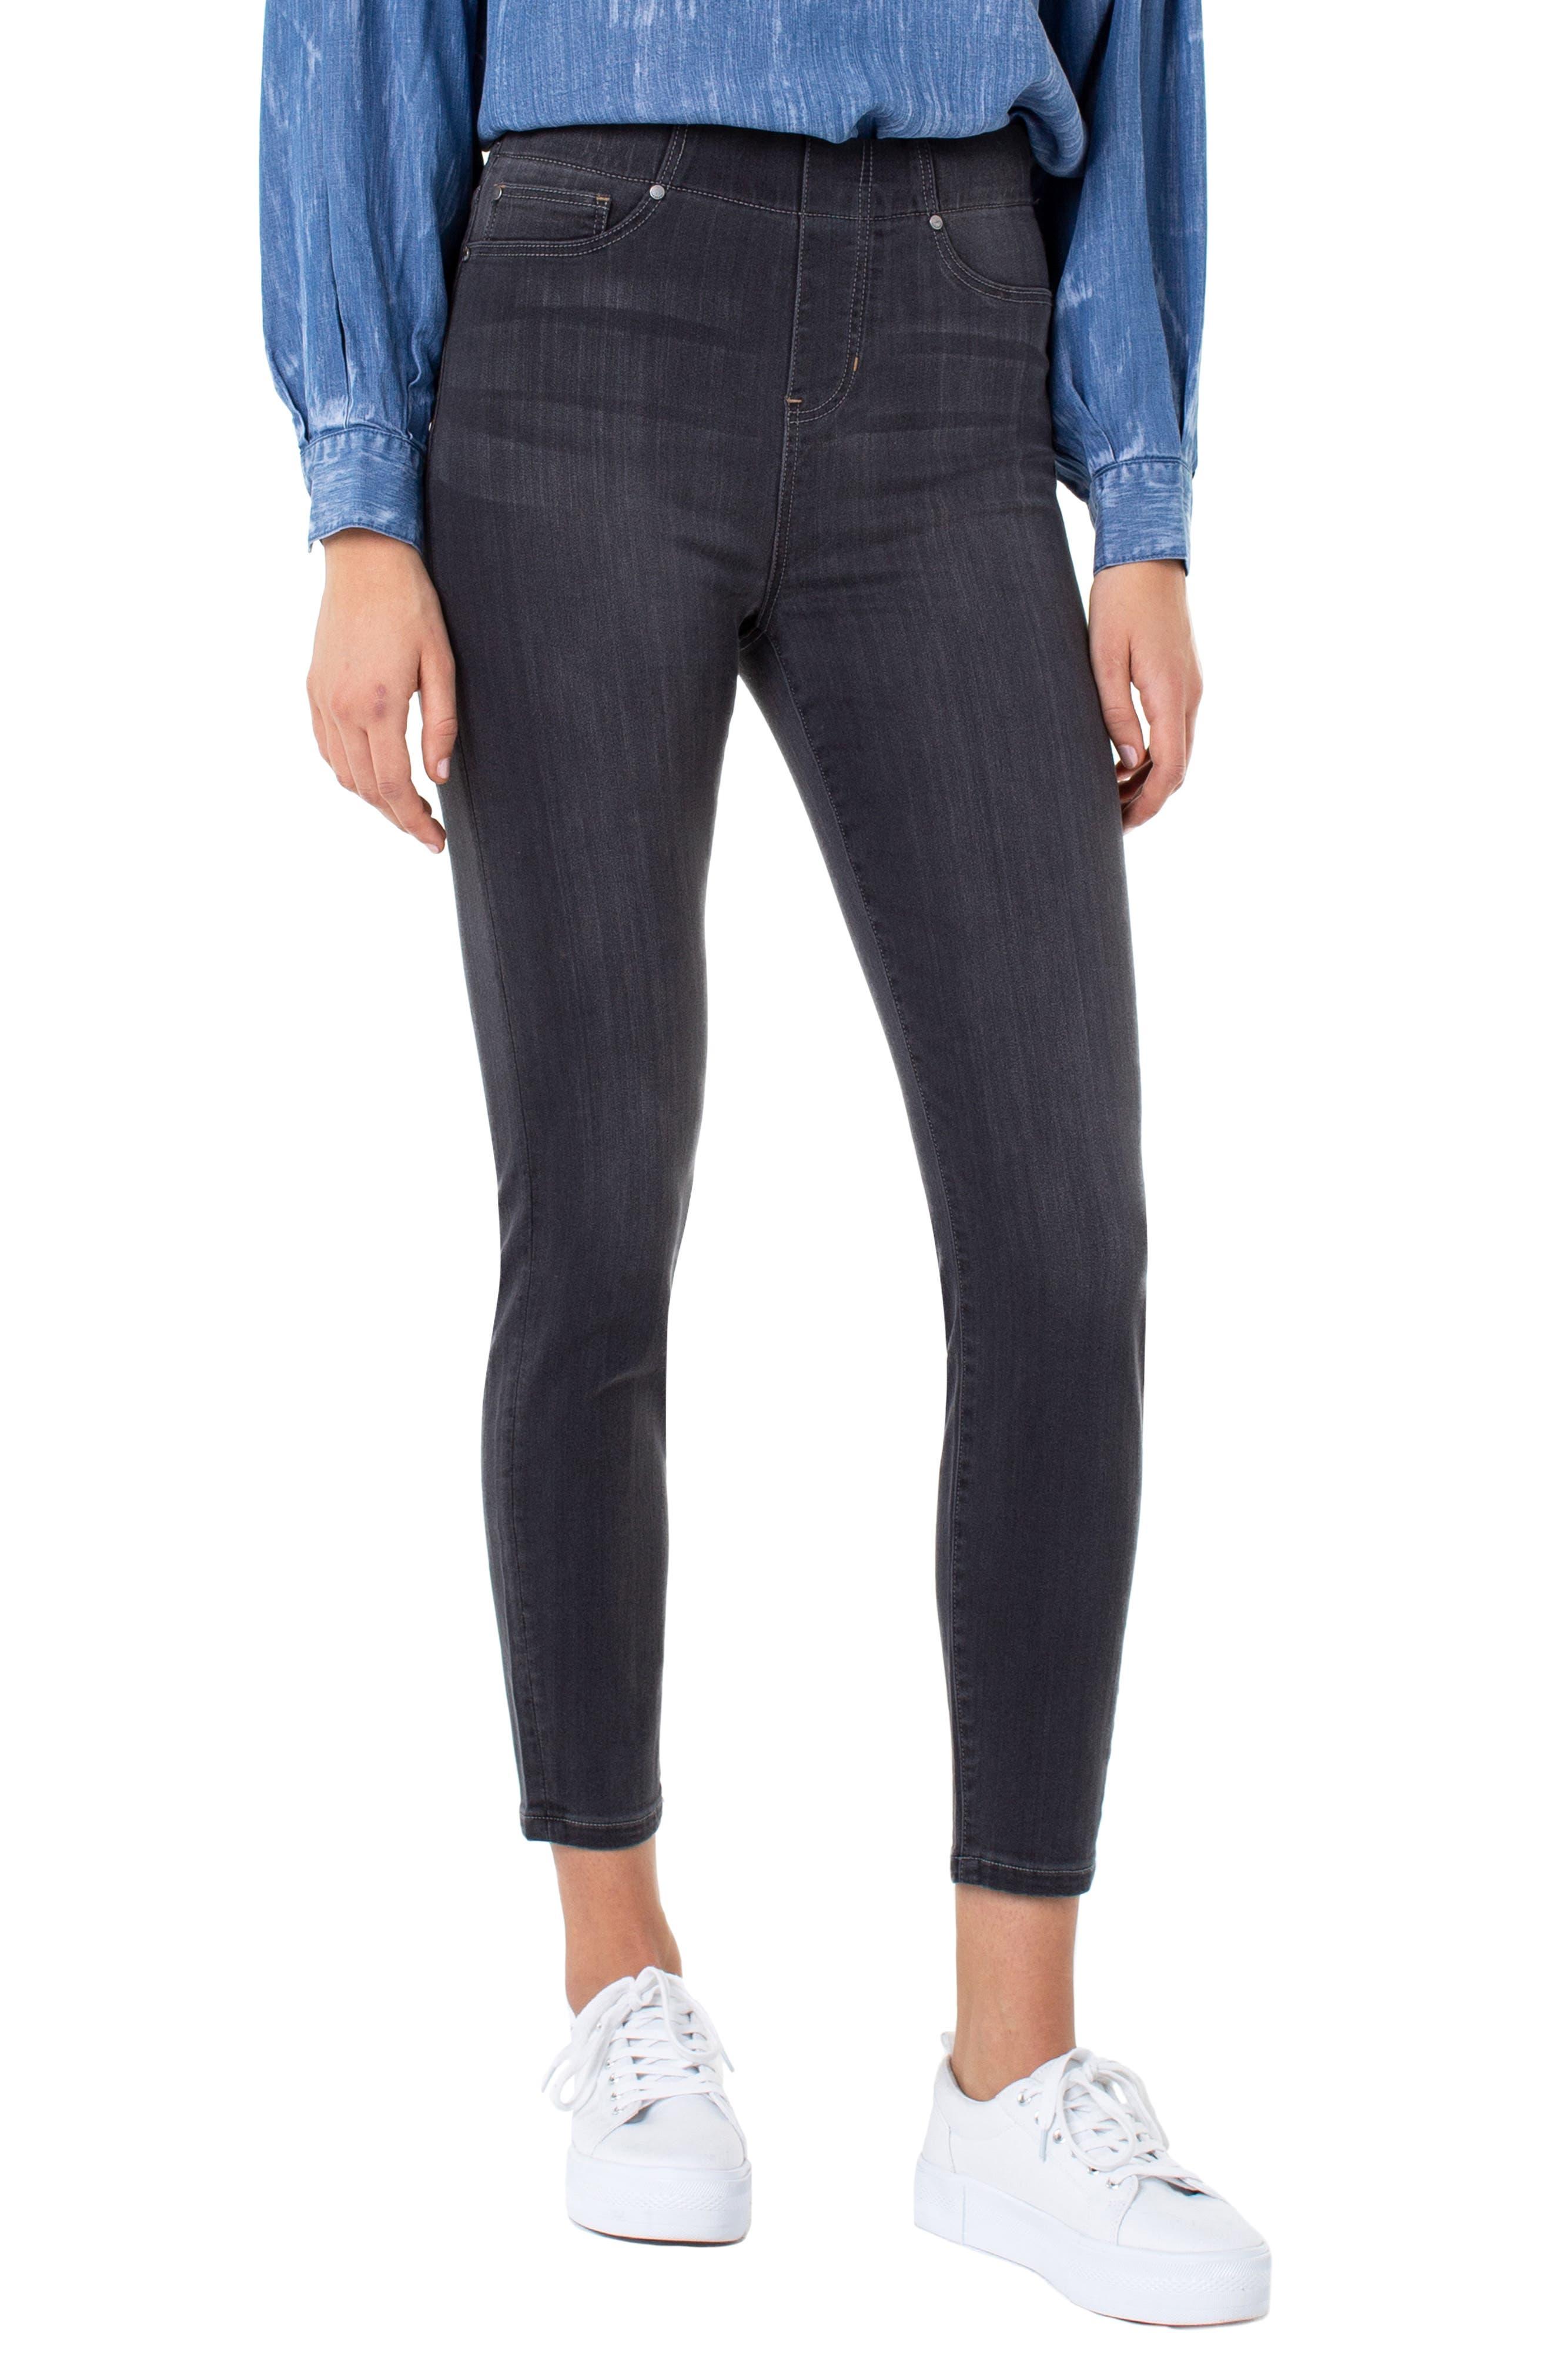 Chloe High Waist Ankle Skinny Jeans